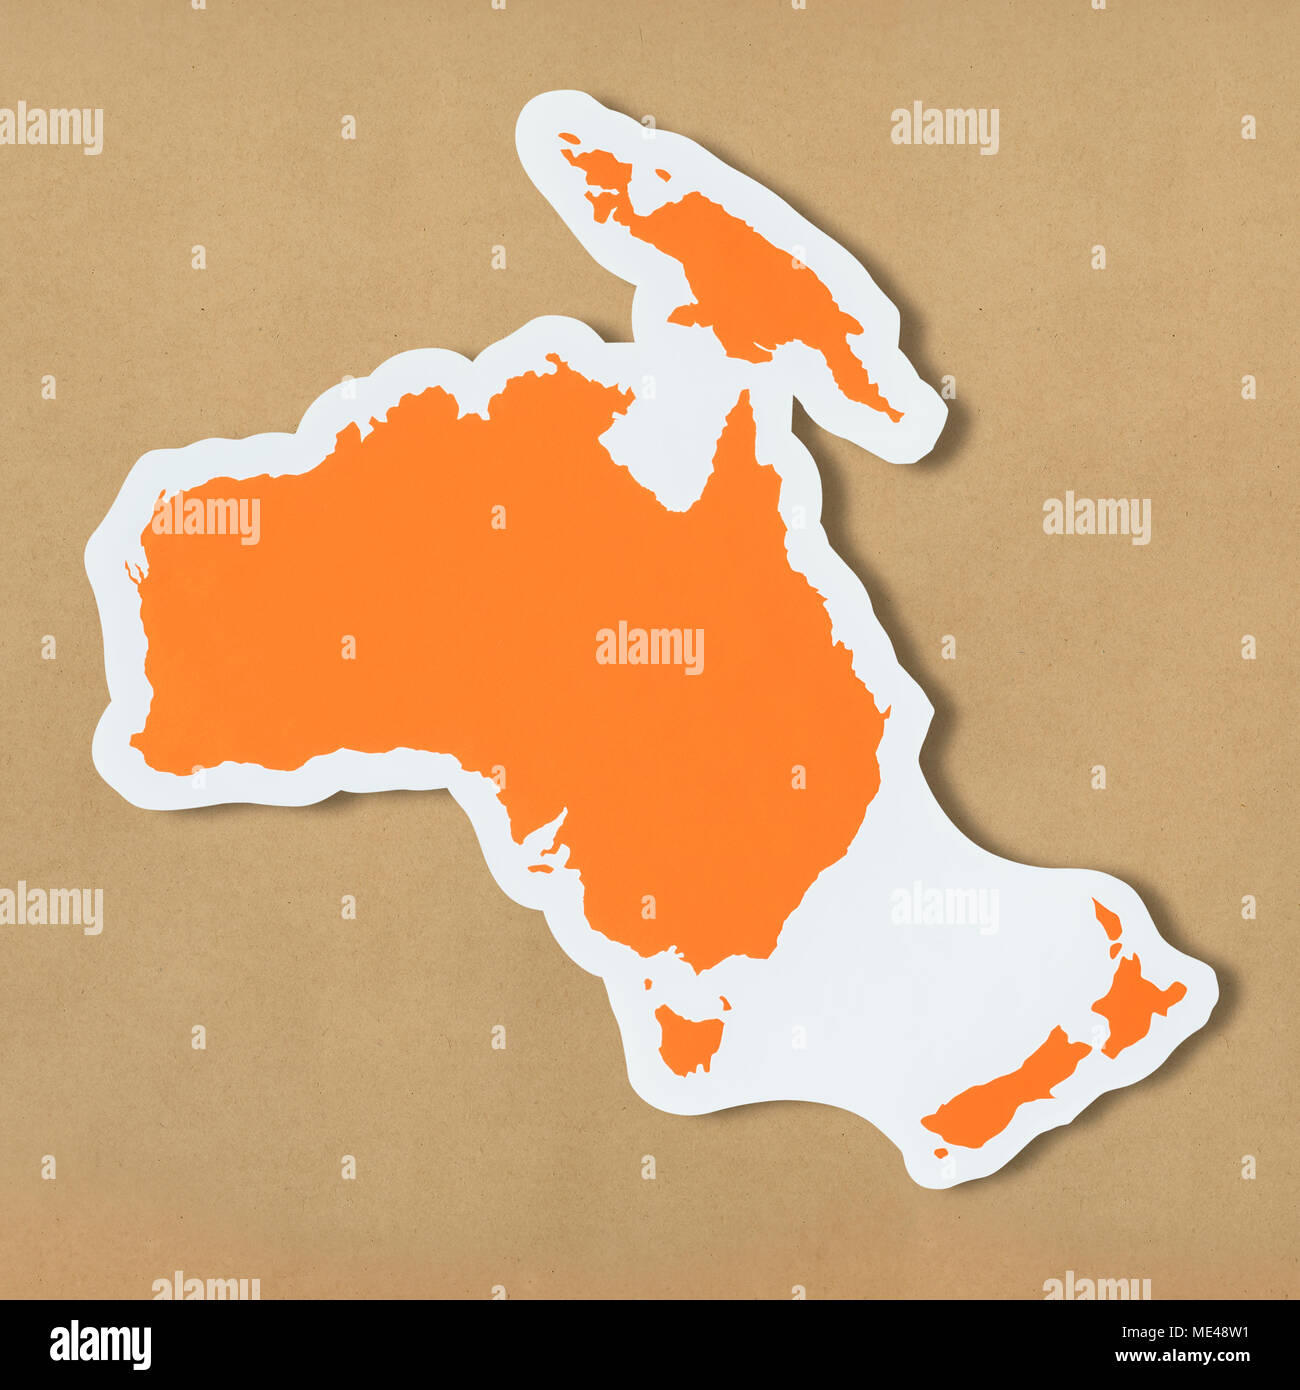 Australasia Map Stock Photos Amp Australasia Map Stock